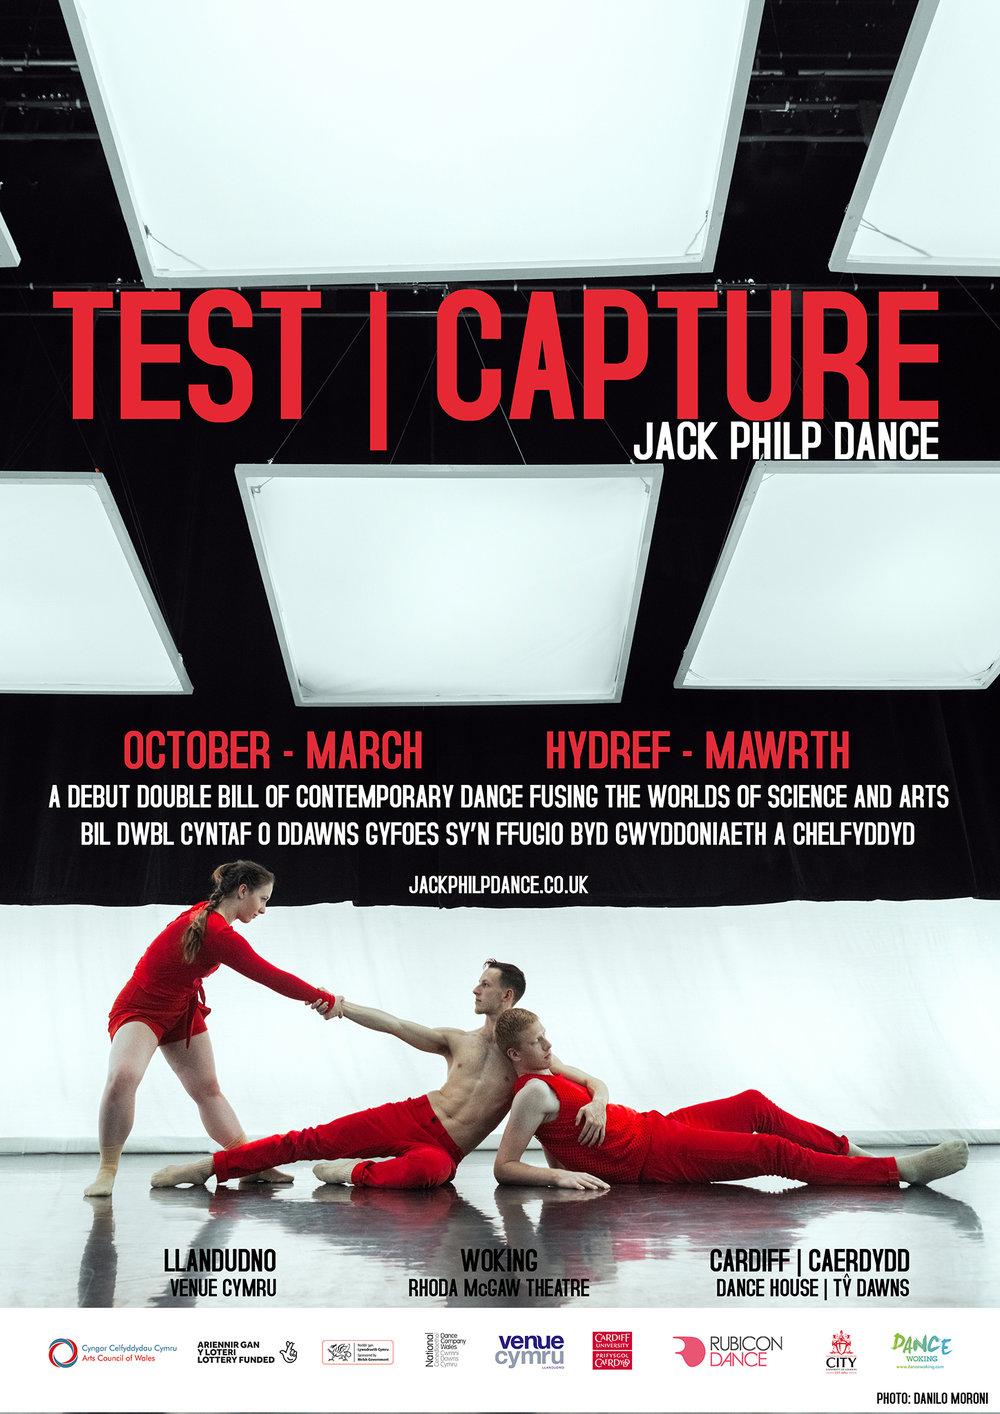 TEST_CAPTURE - JACK PHILP DANCE - FinalEdit2 - 2048px.jpg